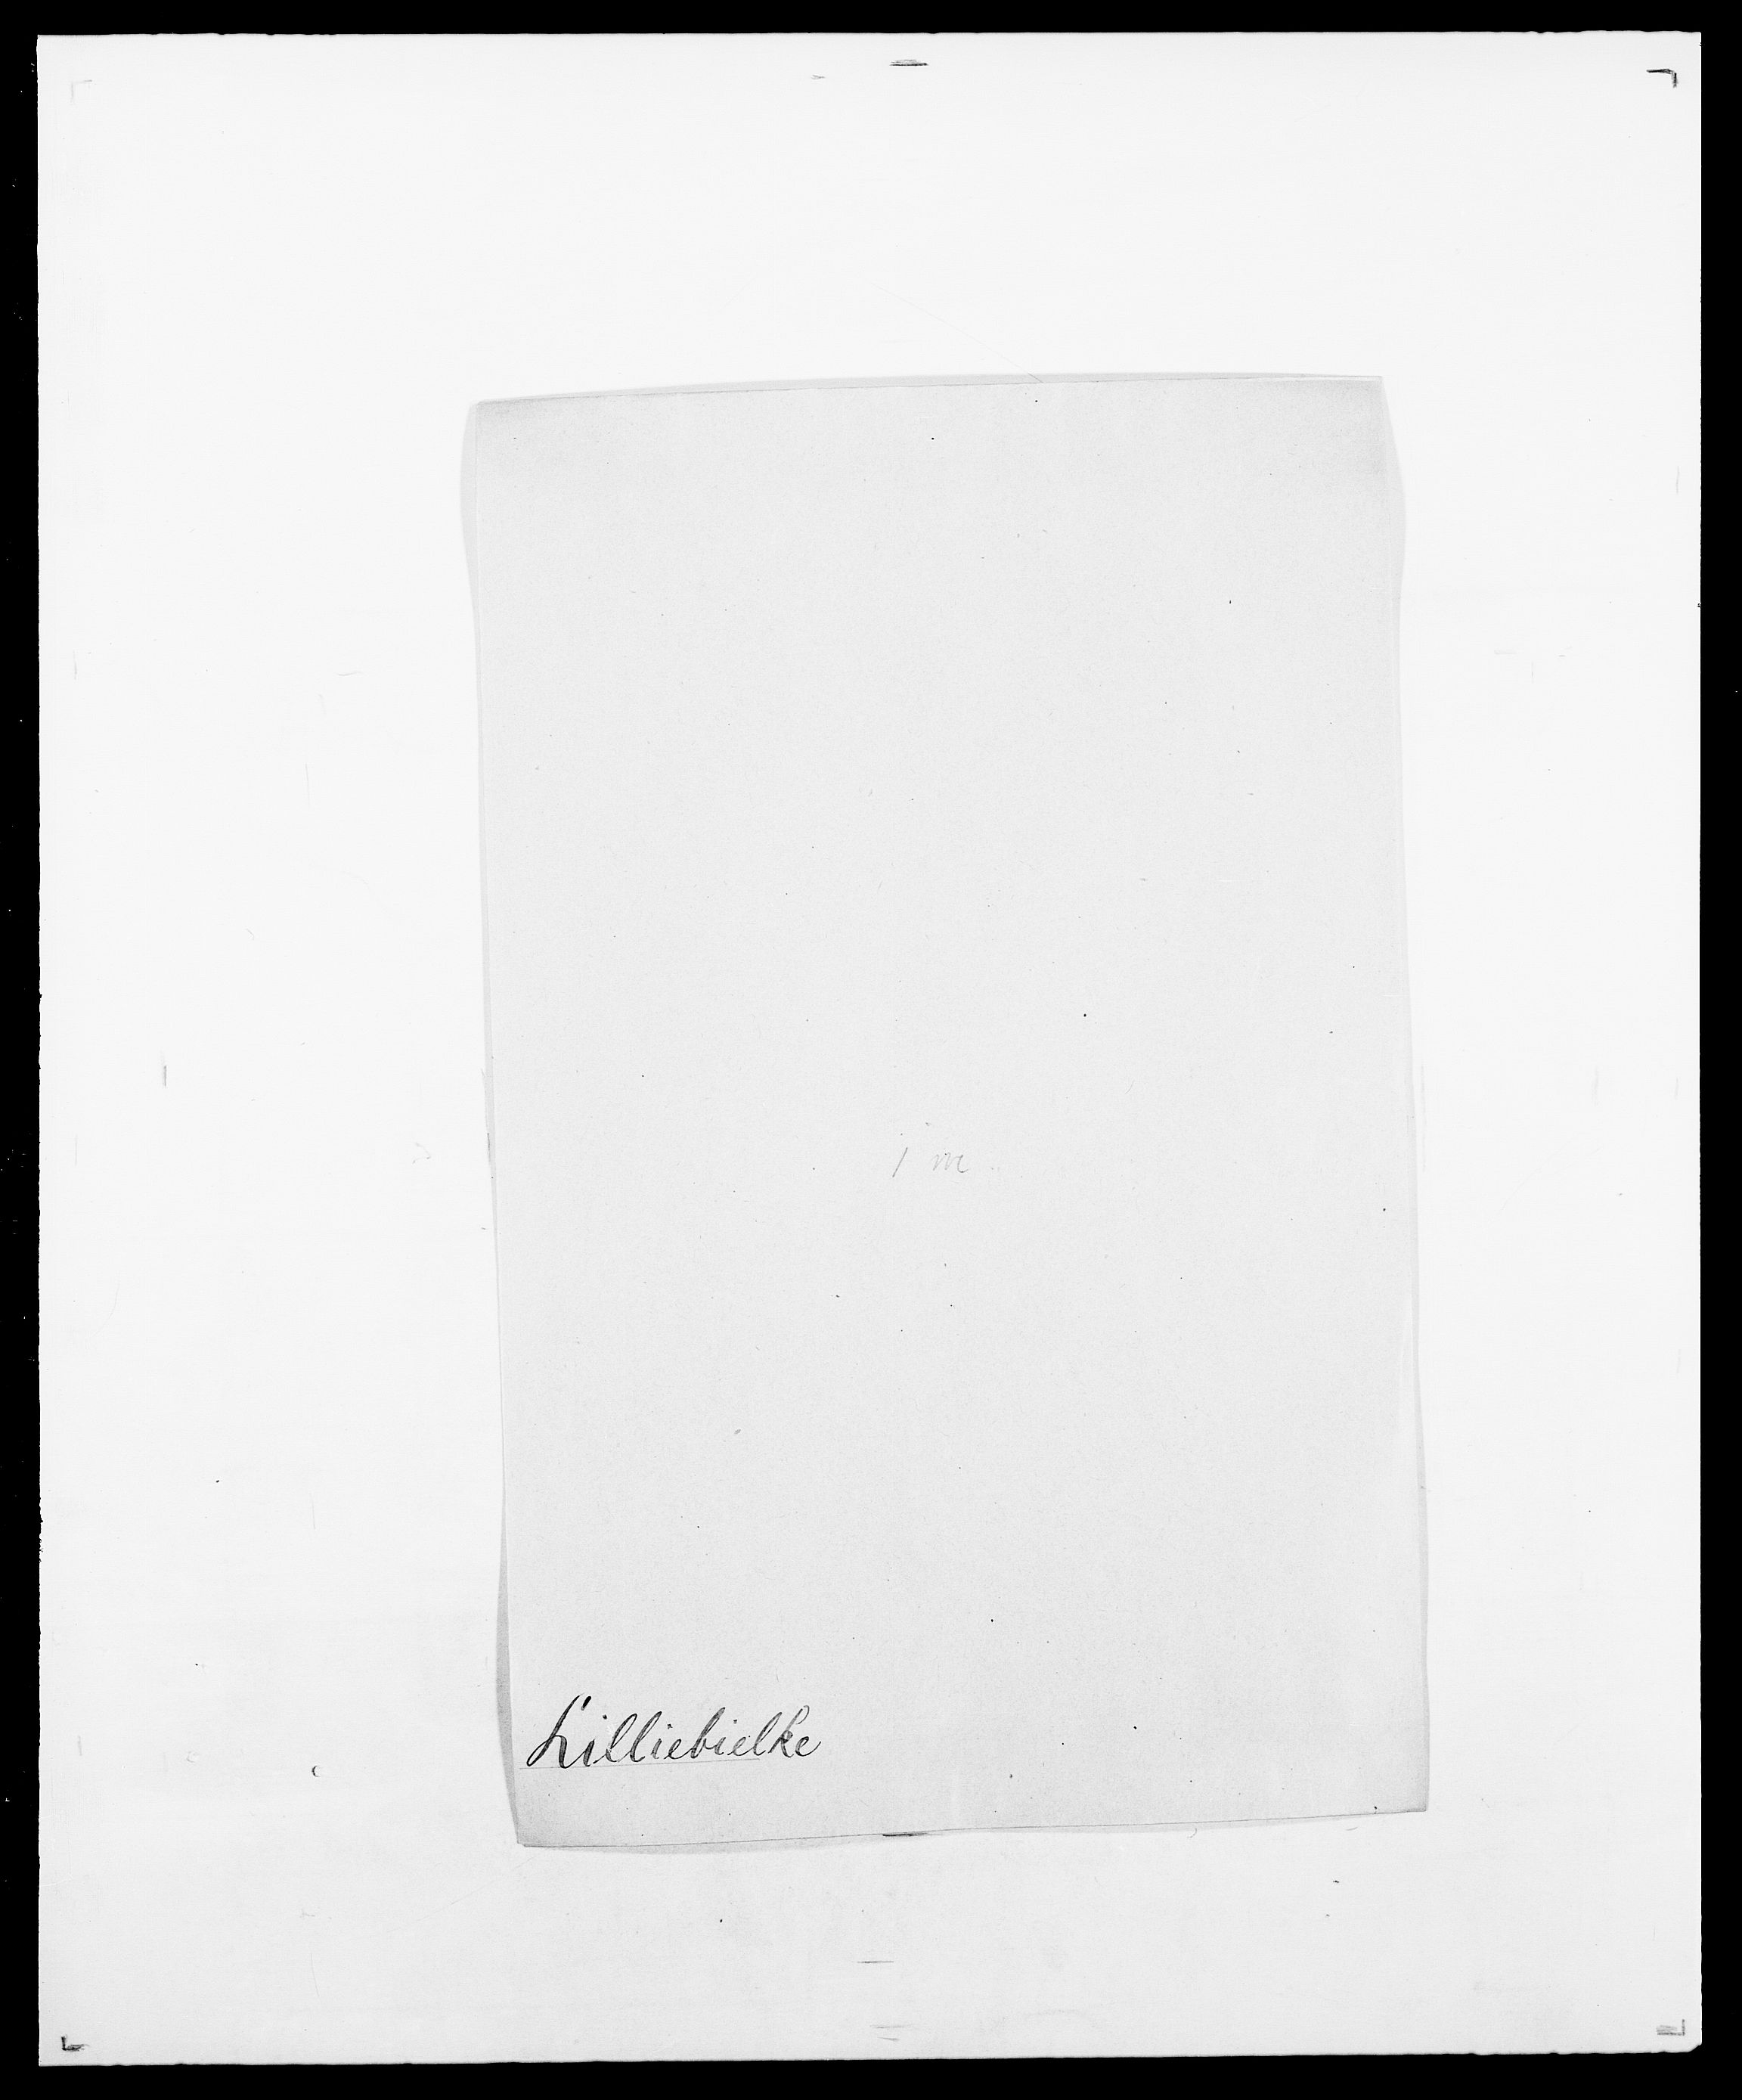 SAO, Delgobe, Charles Antoine - samling, D/Da/L0023: Lau - Lirvyn, s. 414